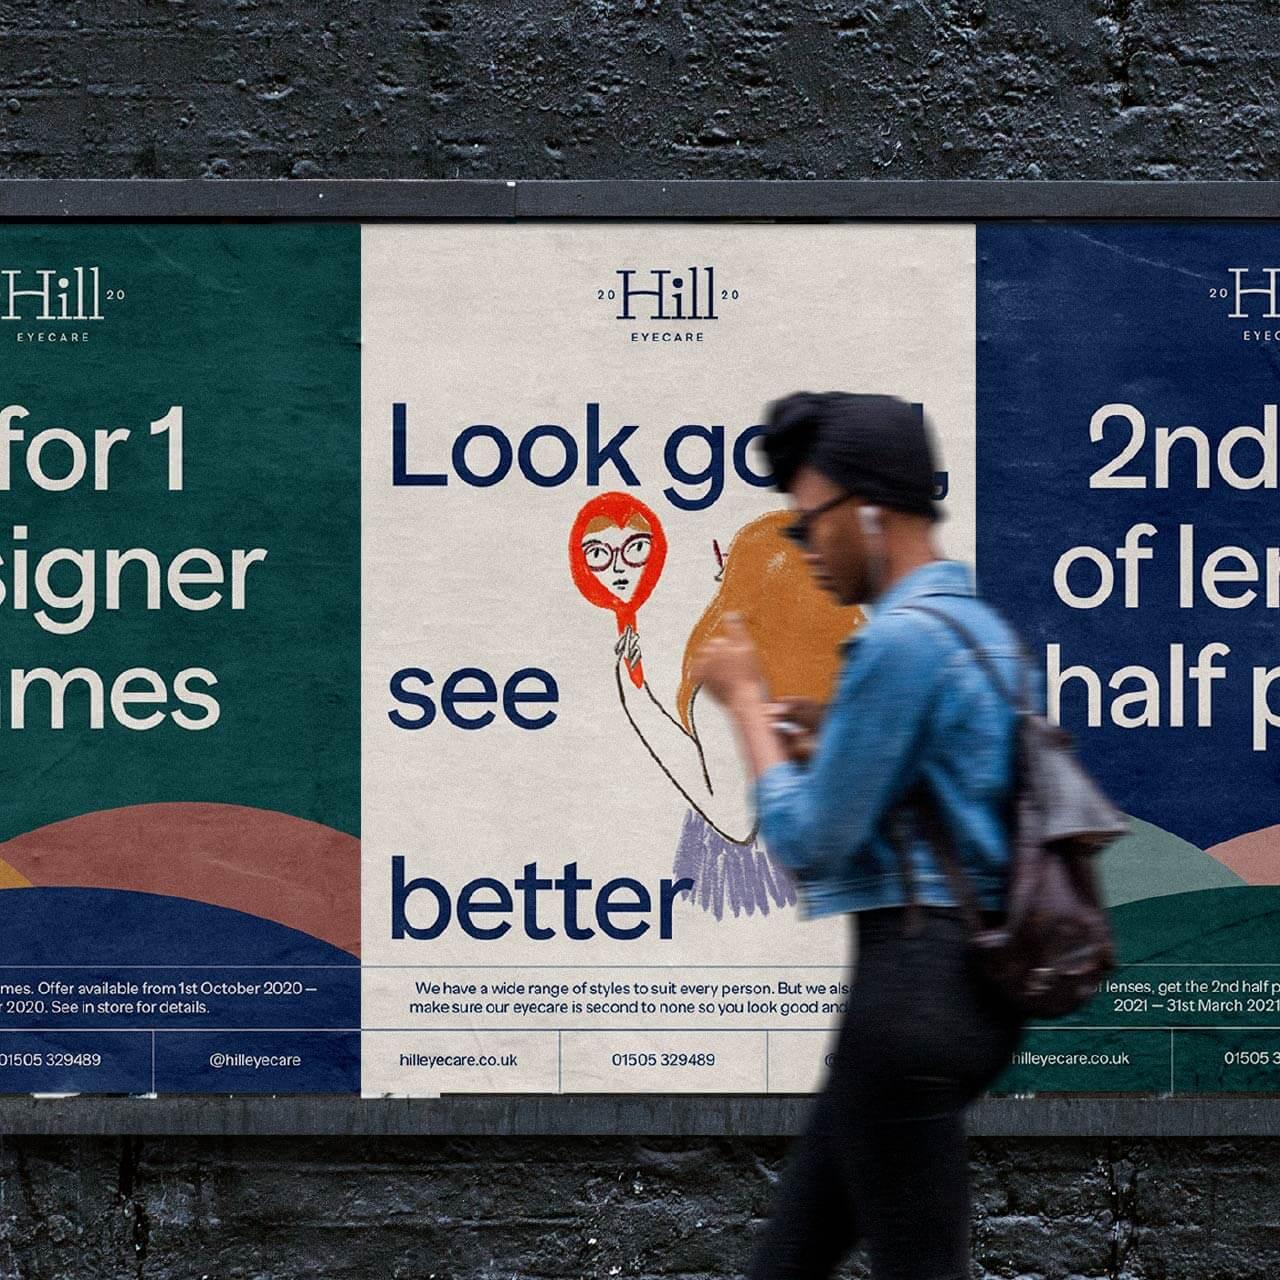 Hill Eyecare